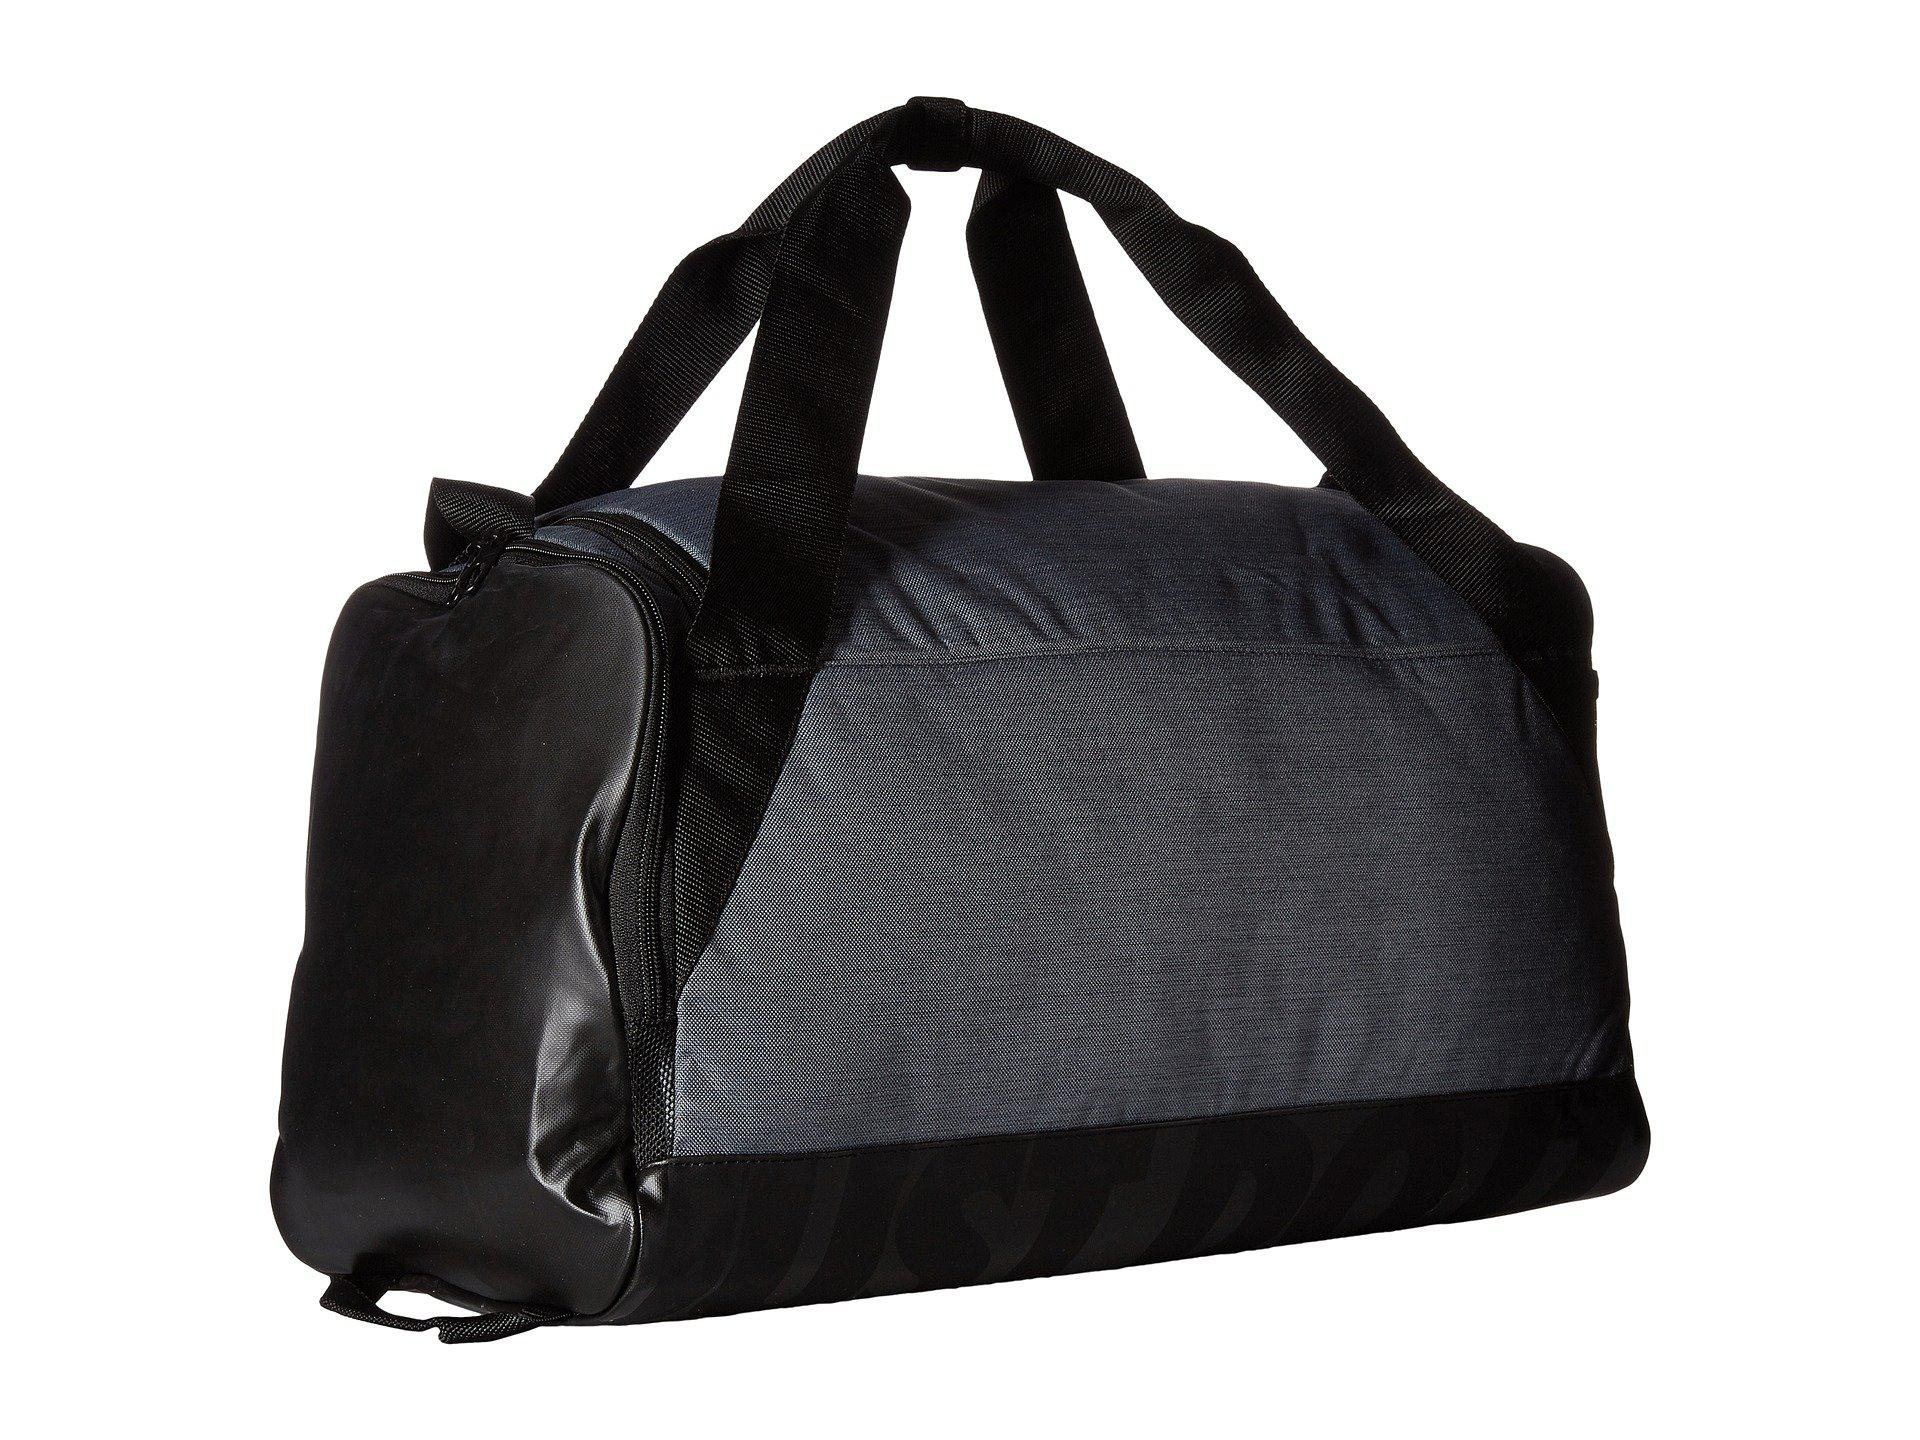 ... Lyst - Nike Brasilia Small Duffel Bag (midnight Navyblackwhi big sale  69659 5c3b4 ... ba057c498f